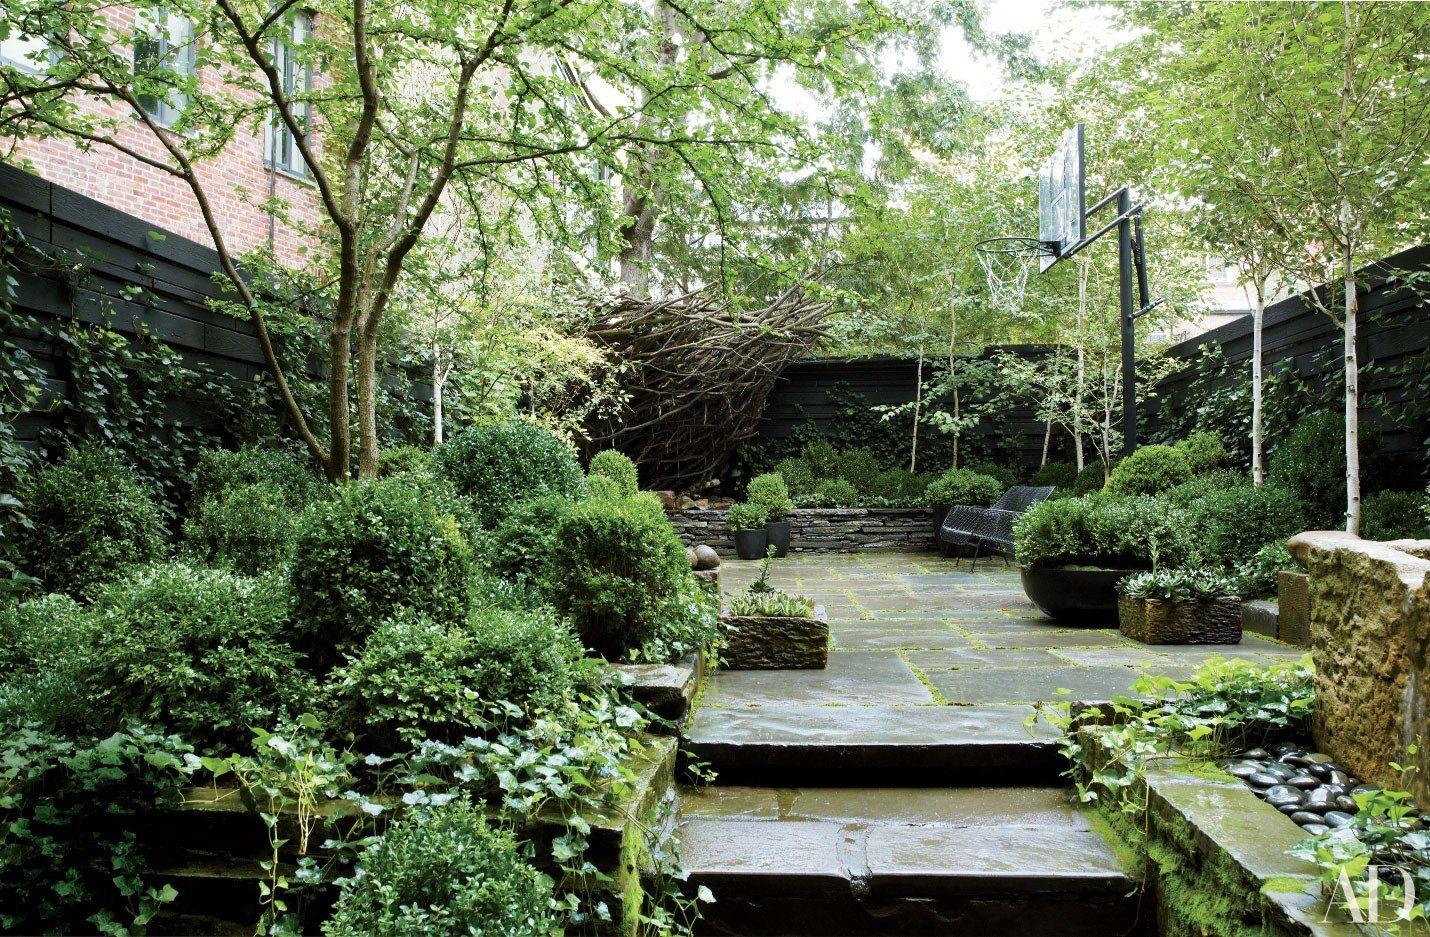 Landscaped Homes 52 beautifully landscaped home gardens | garden photos, gardens